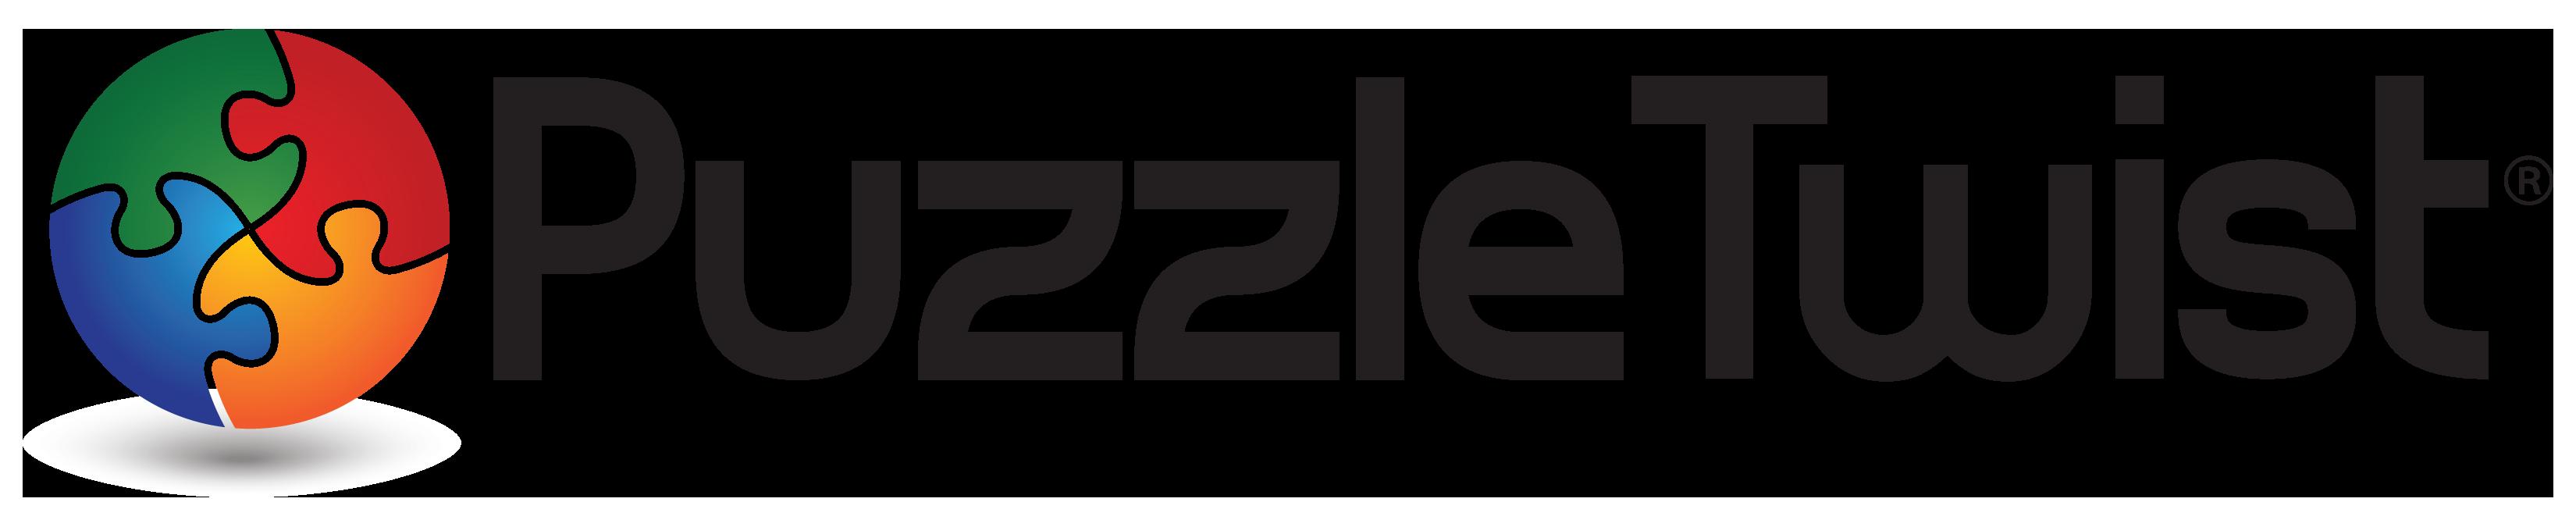 PuzzleTwist Logo